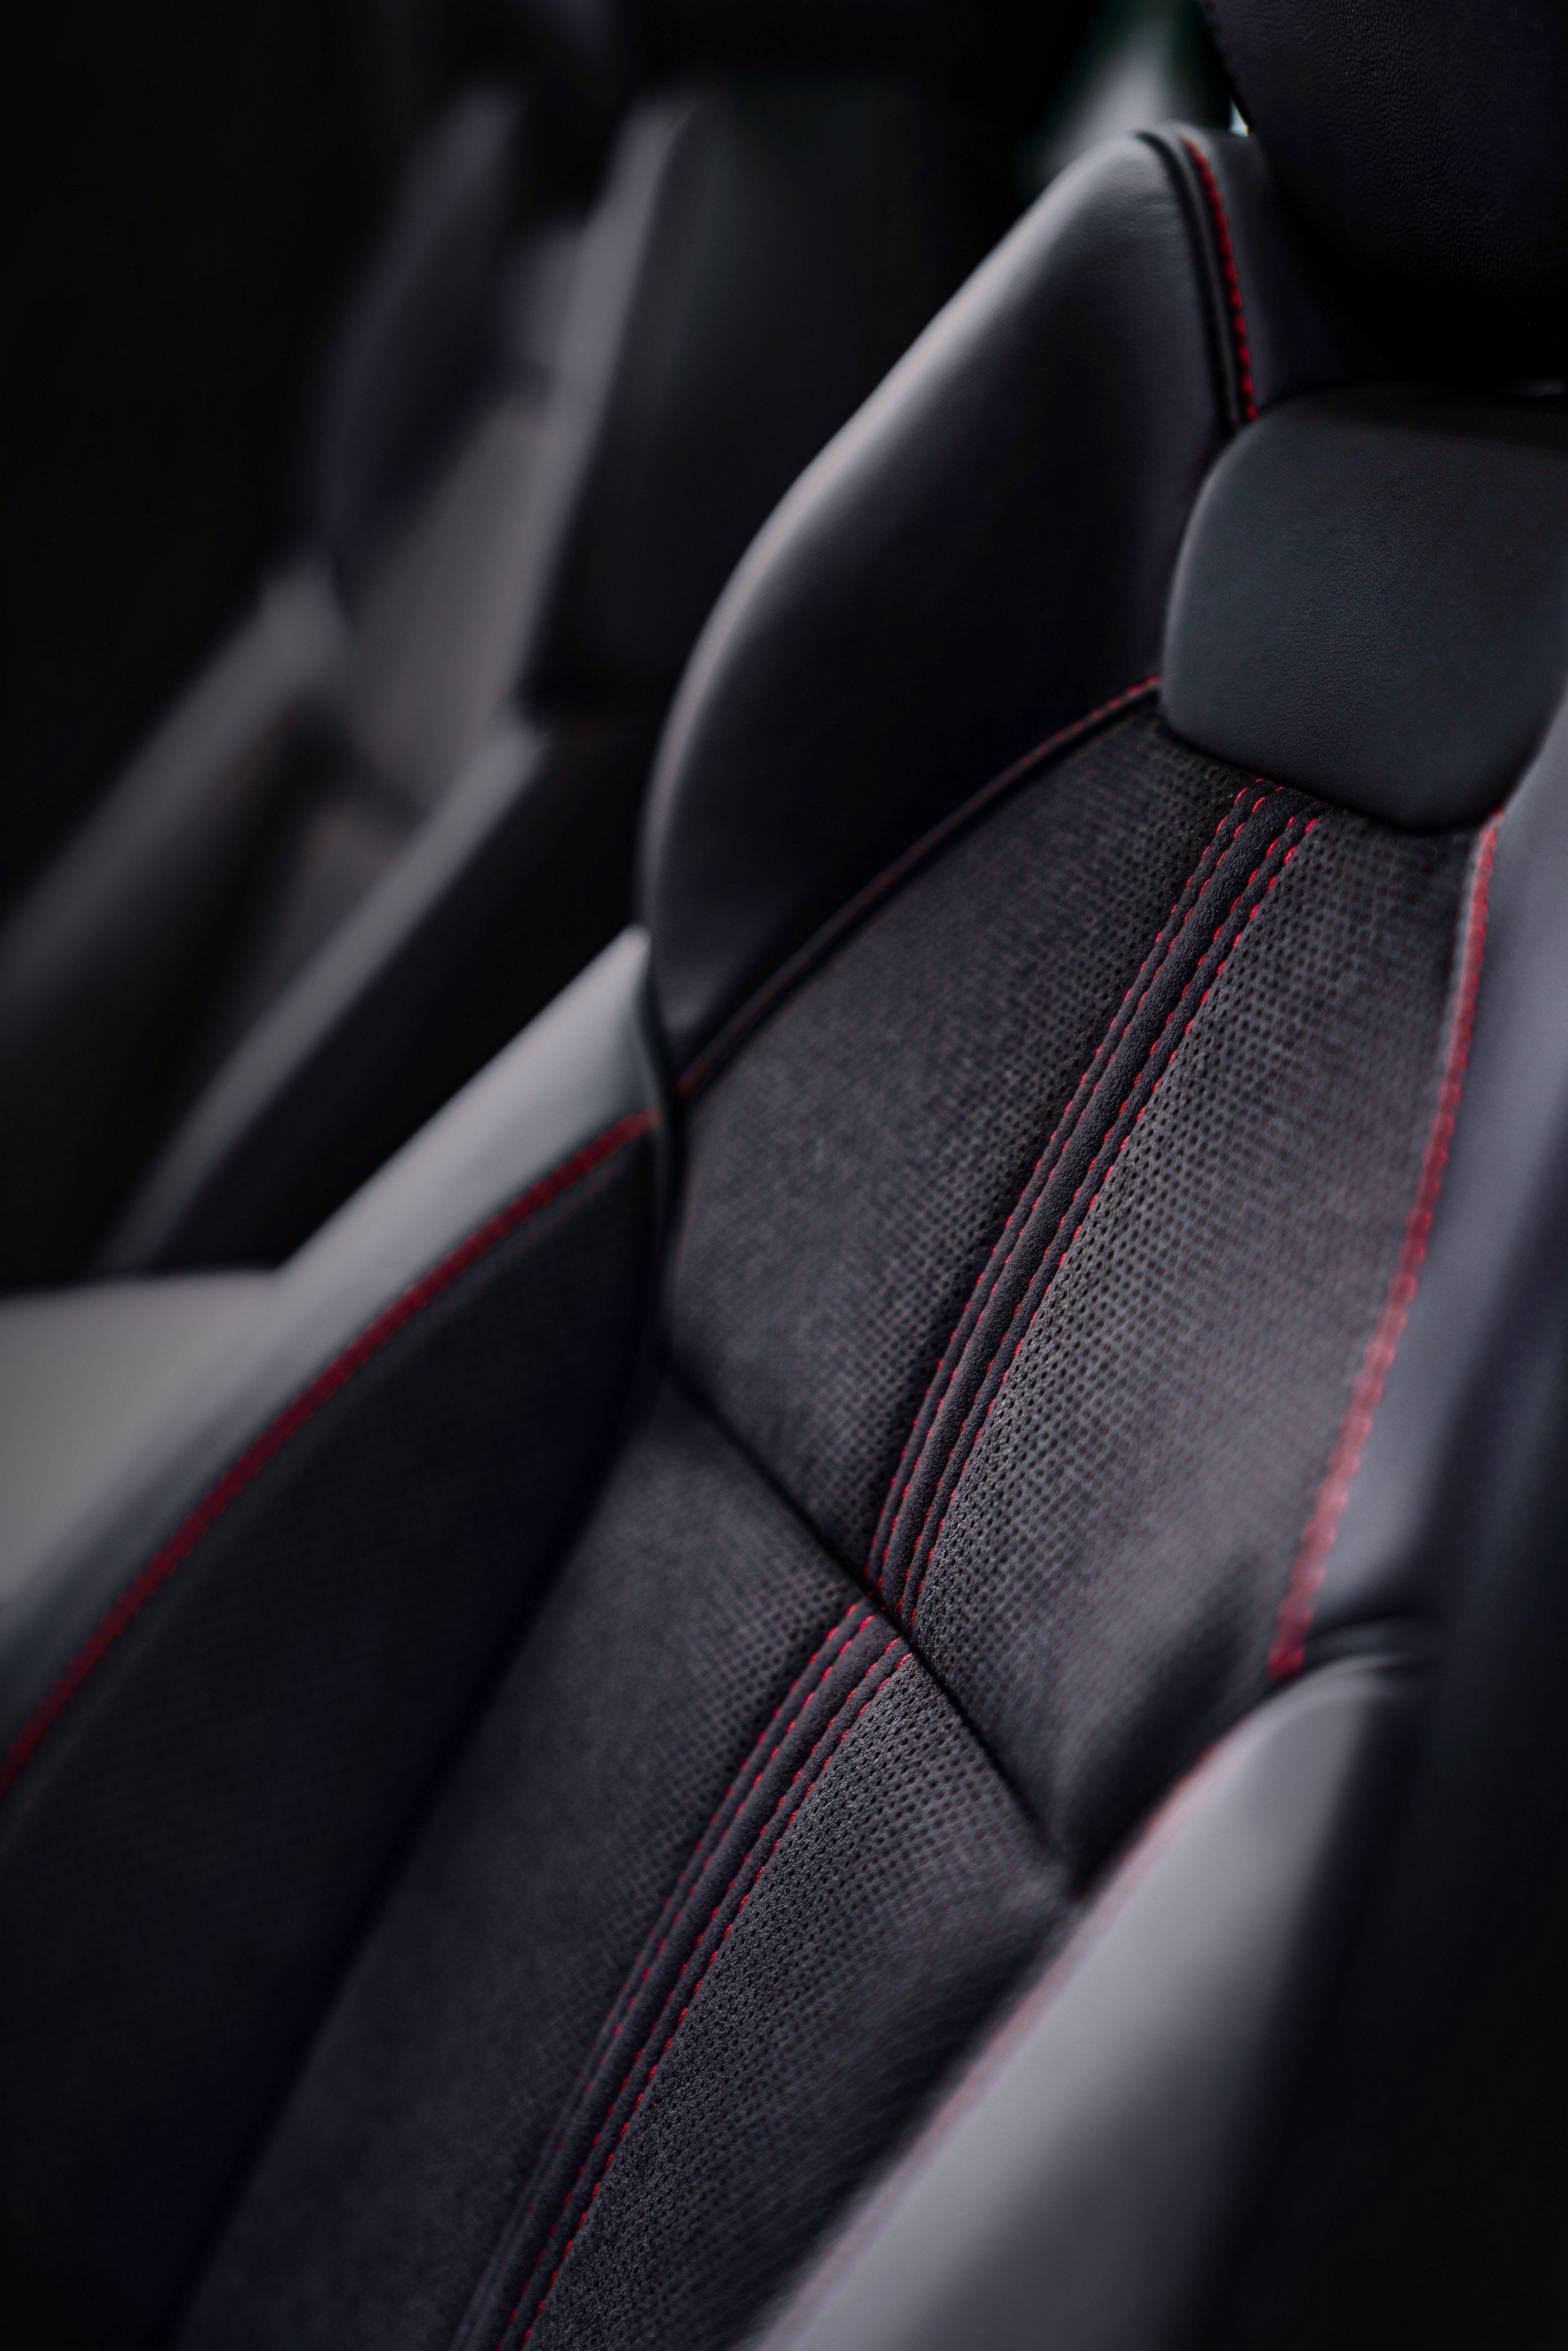 Acura-MDX-PMC-Edition-13